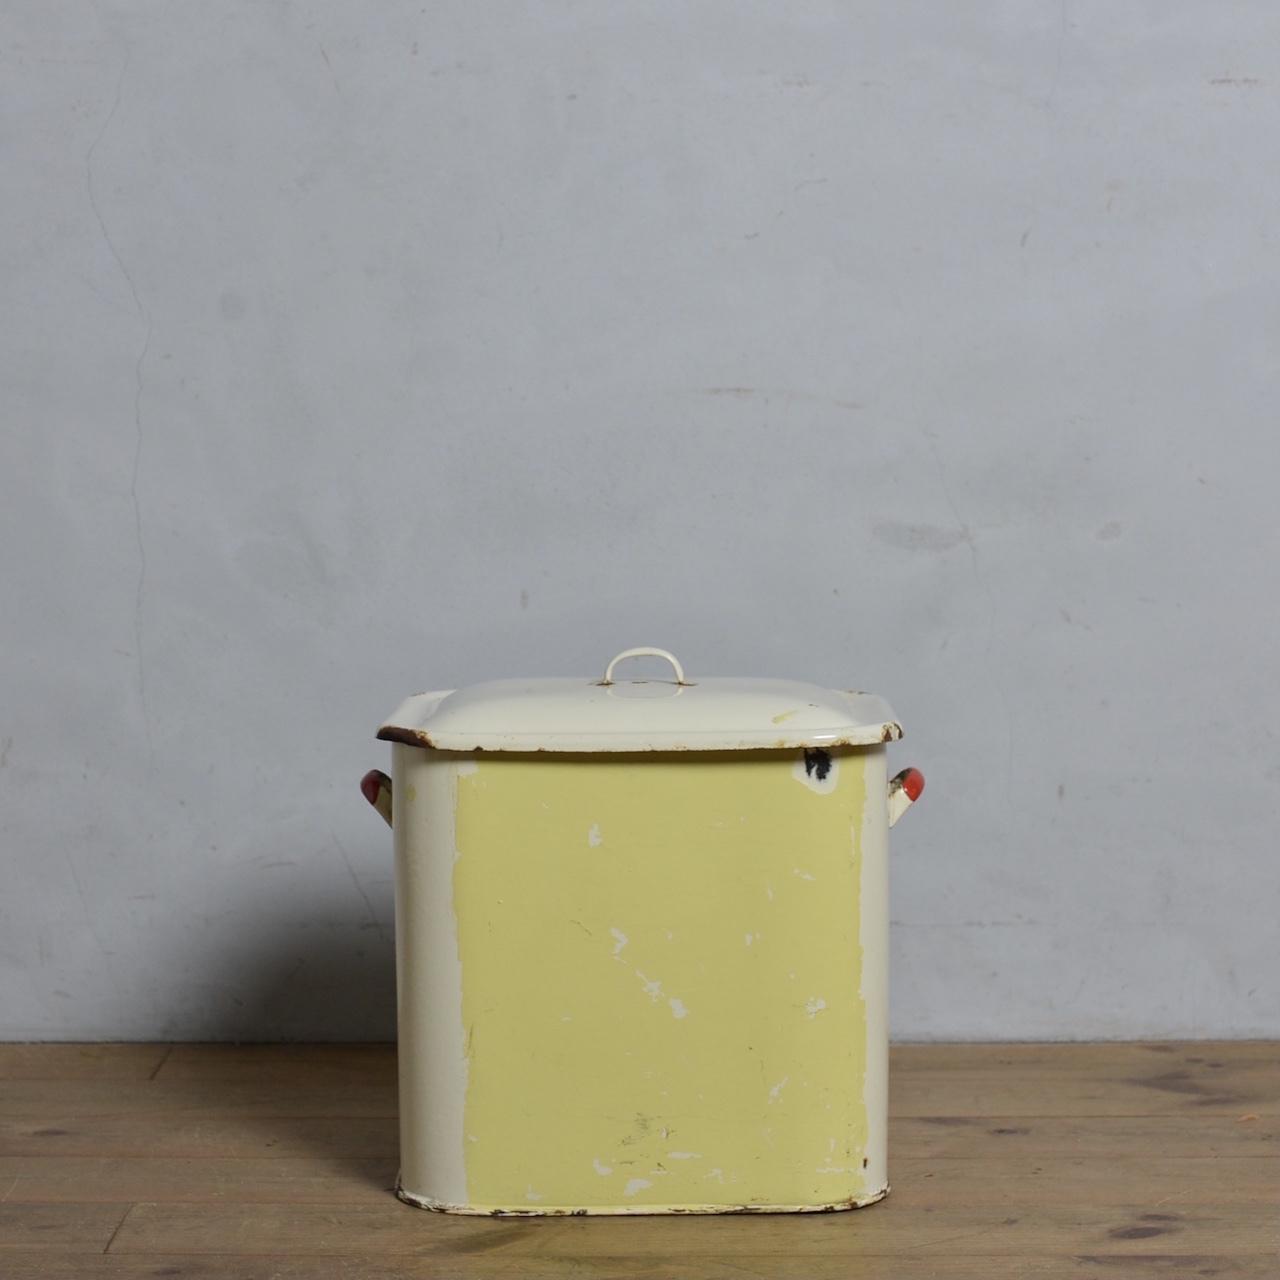 Bread Can / ブレッド カン【A】〈ブレッド缶・ボックス・収納・ホーロー・琺瑯・店舗什器・アンティーク・ヴィンテージ〉112183